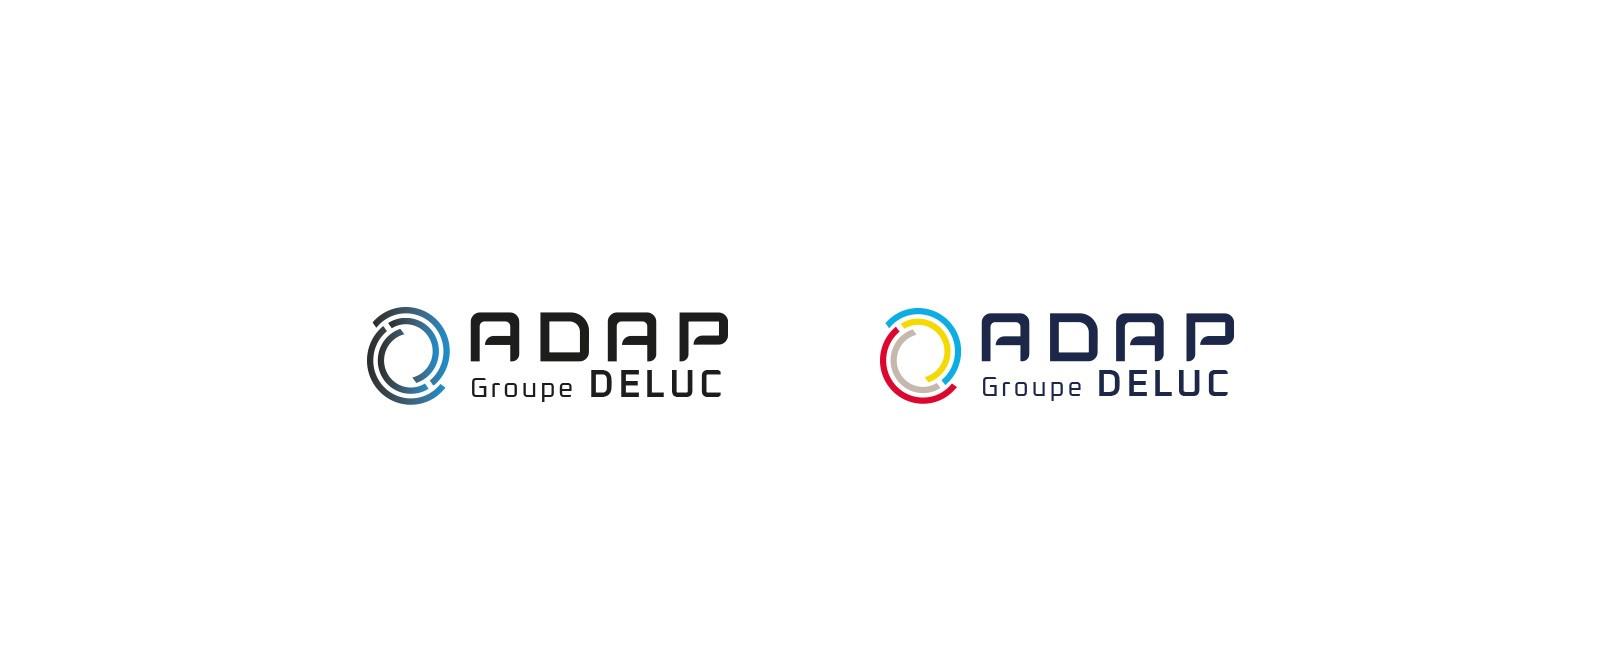 proposition logos